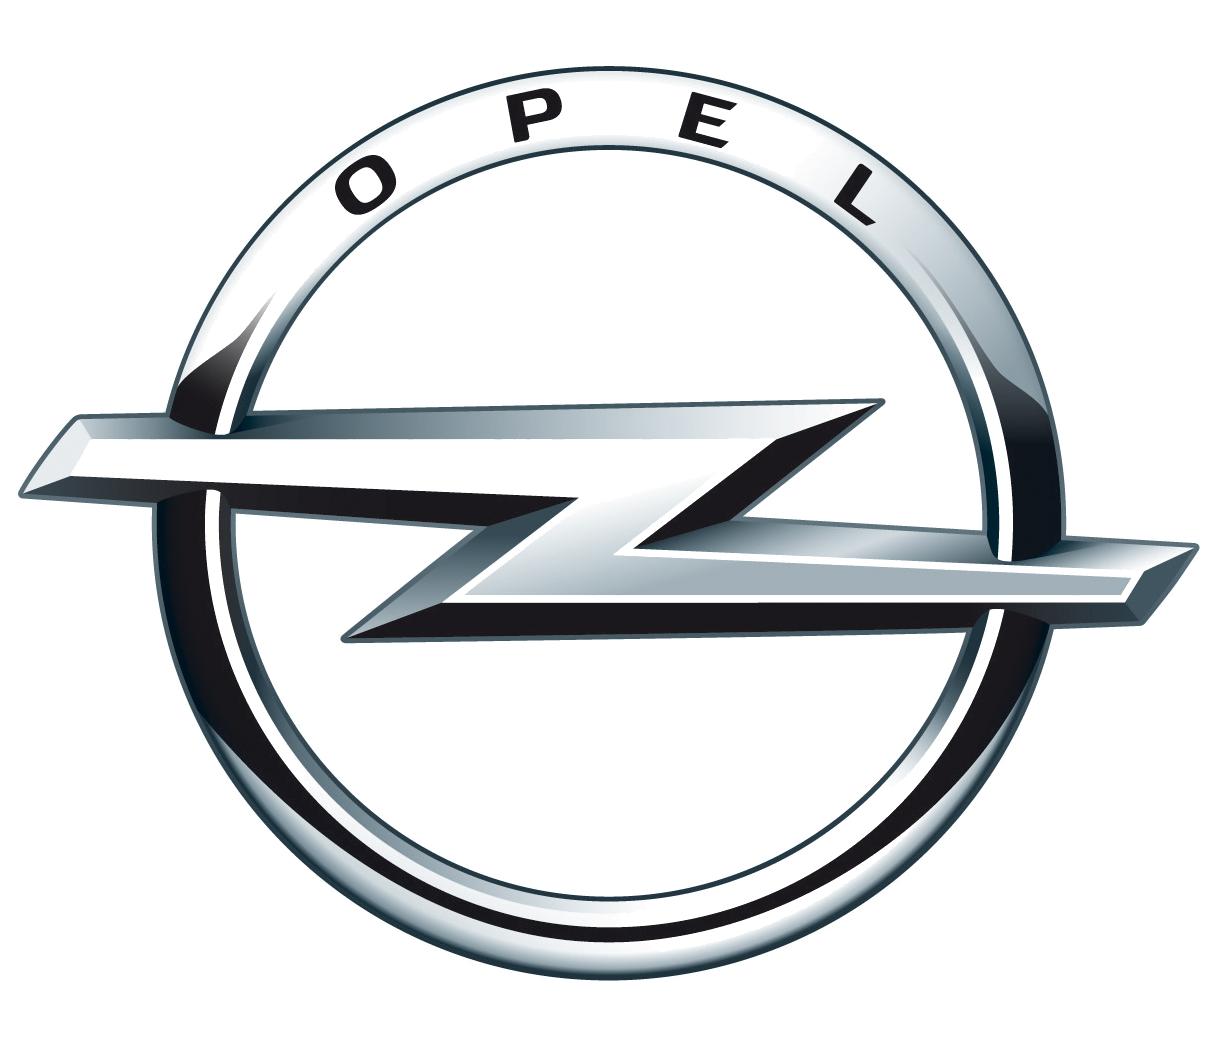 Opel car logo PNG brand image - Opel HD PNG